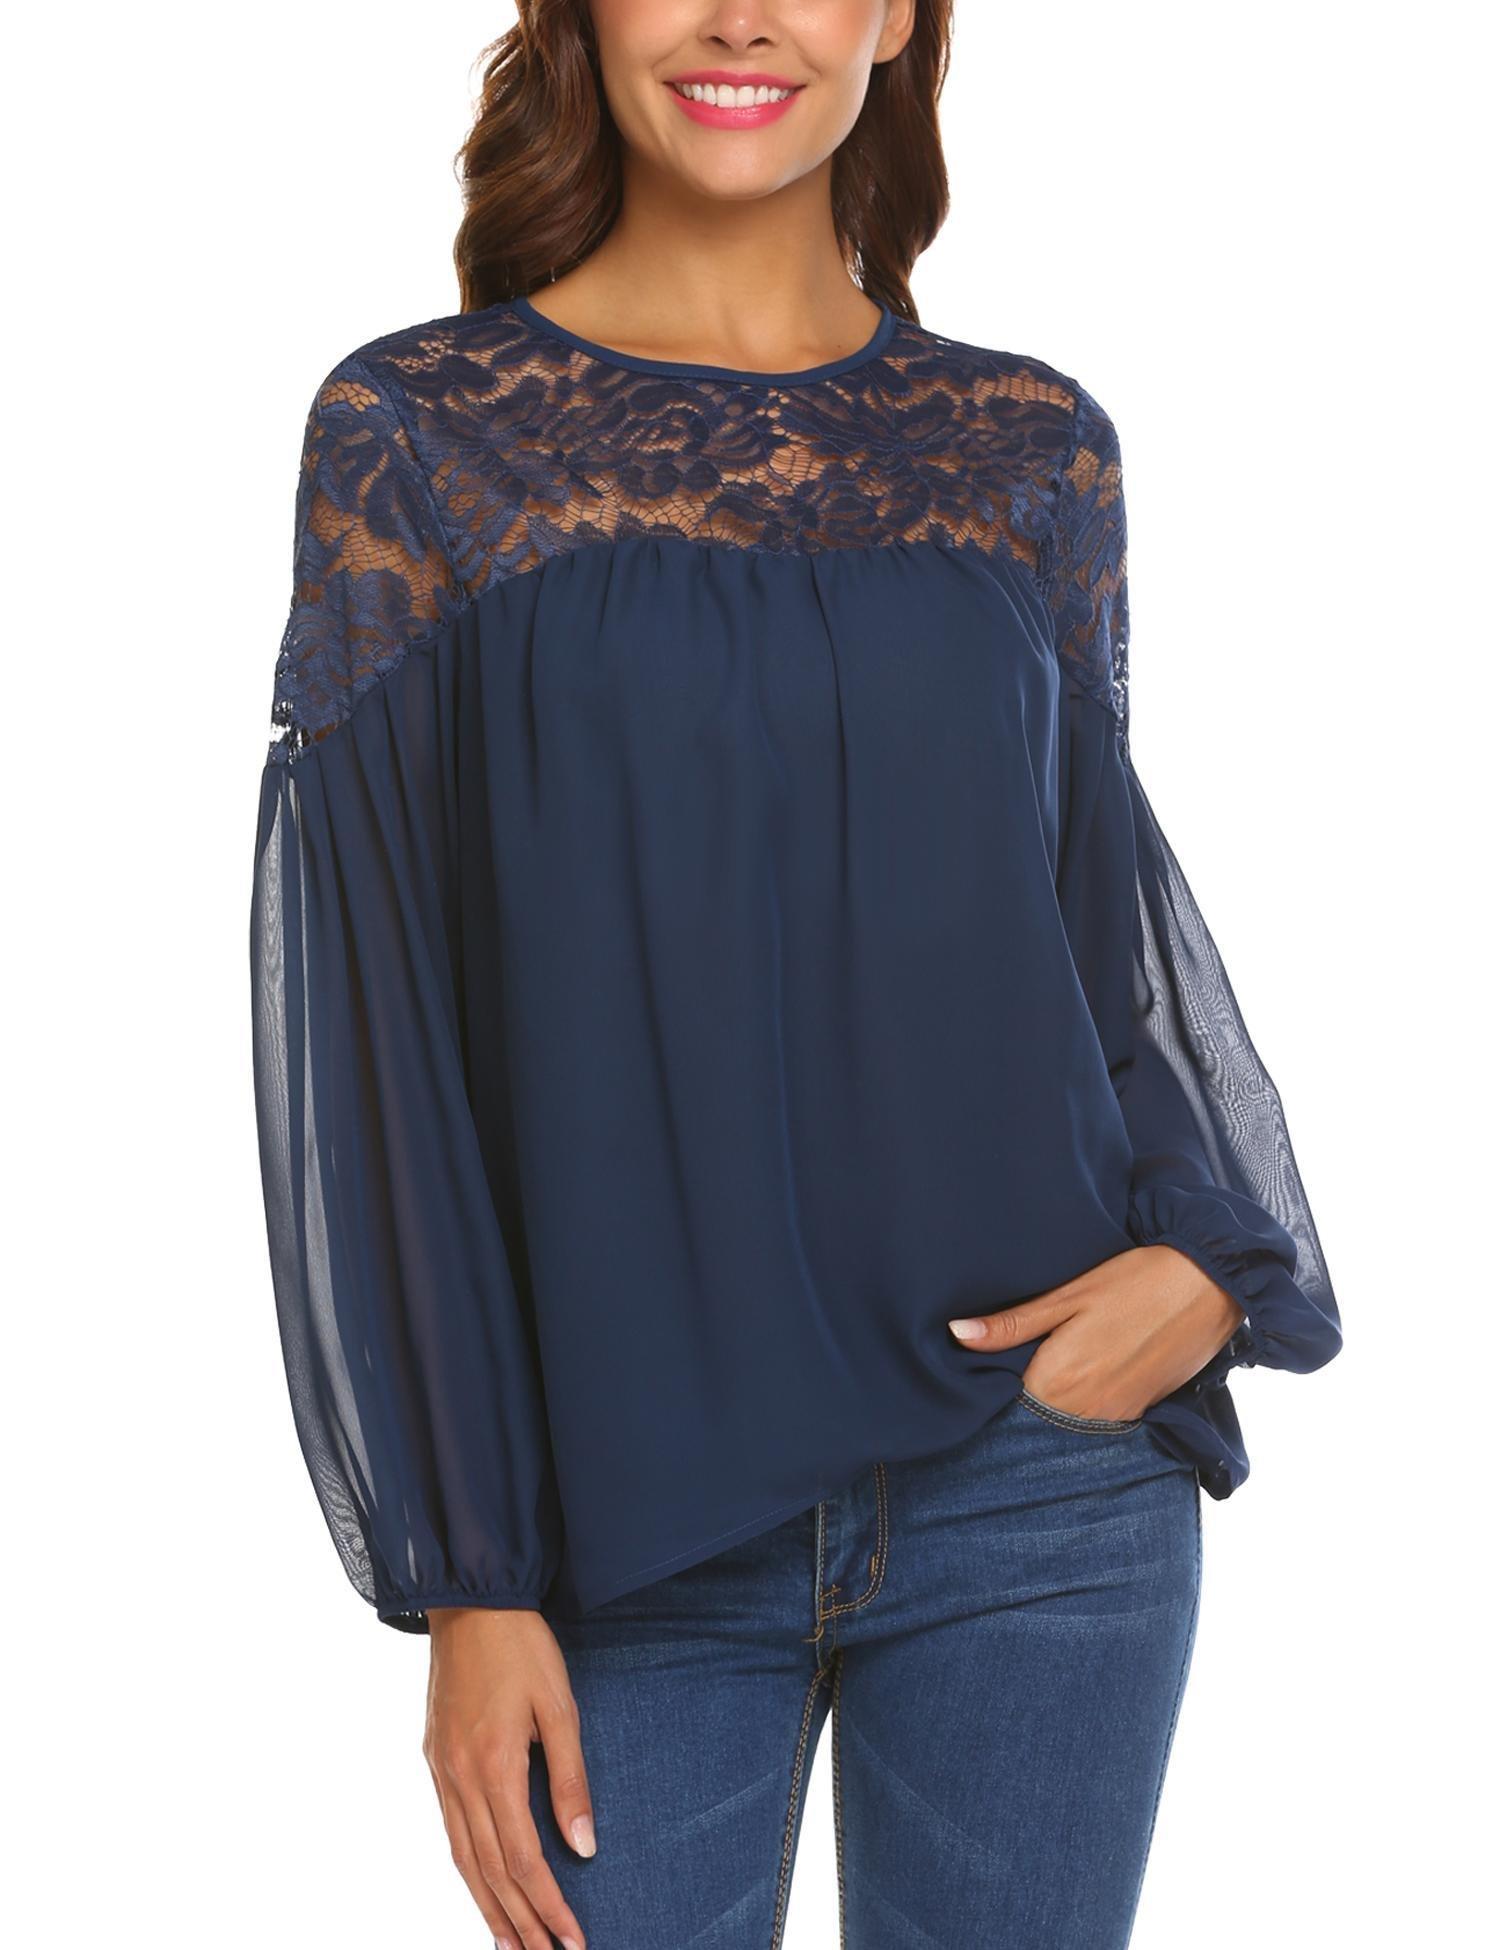 ELESOL Women's Sexy Long Sleeve Shirt Lace Sheer Tops Navy Blue X-Large